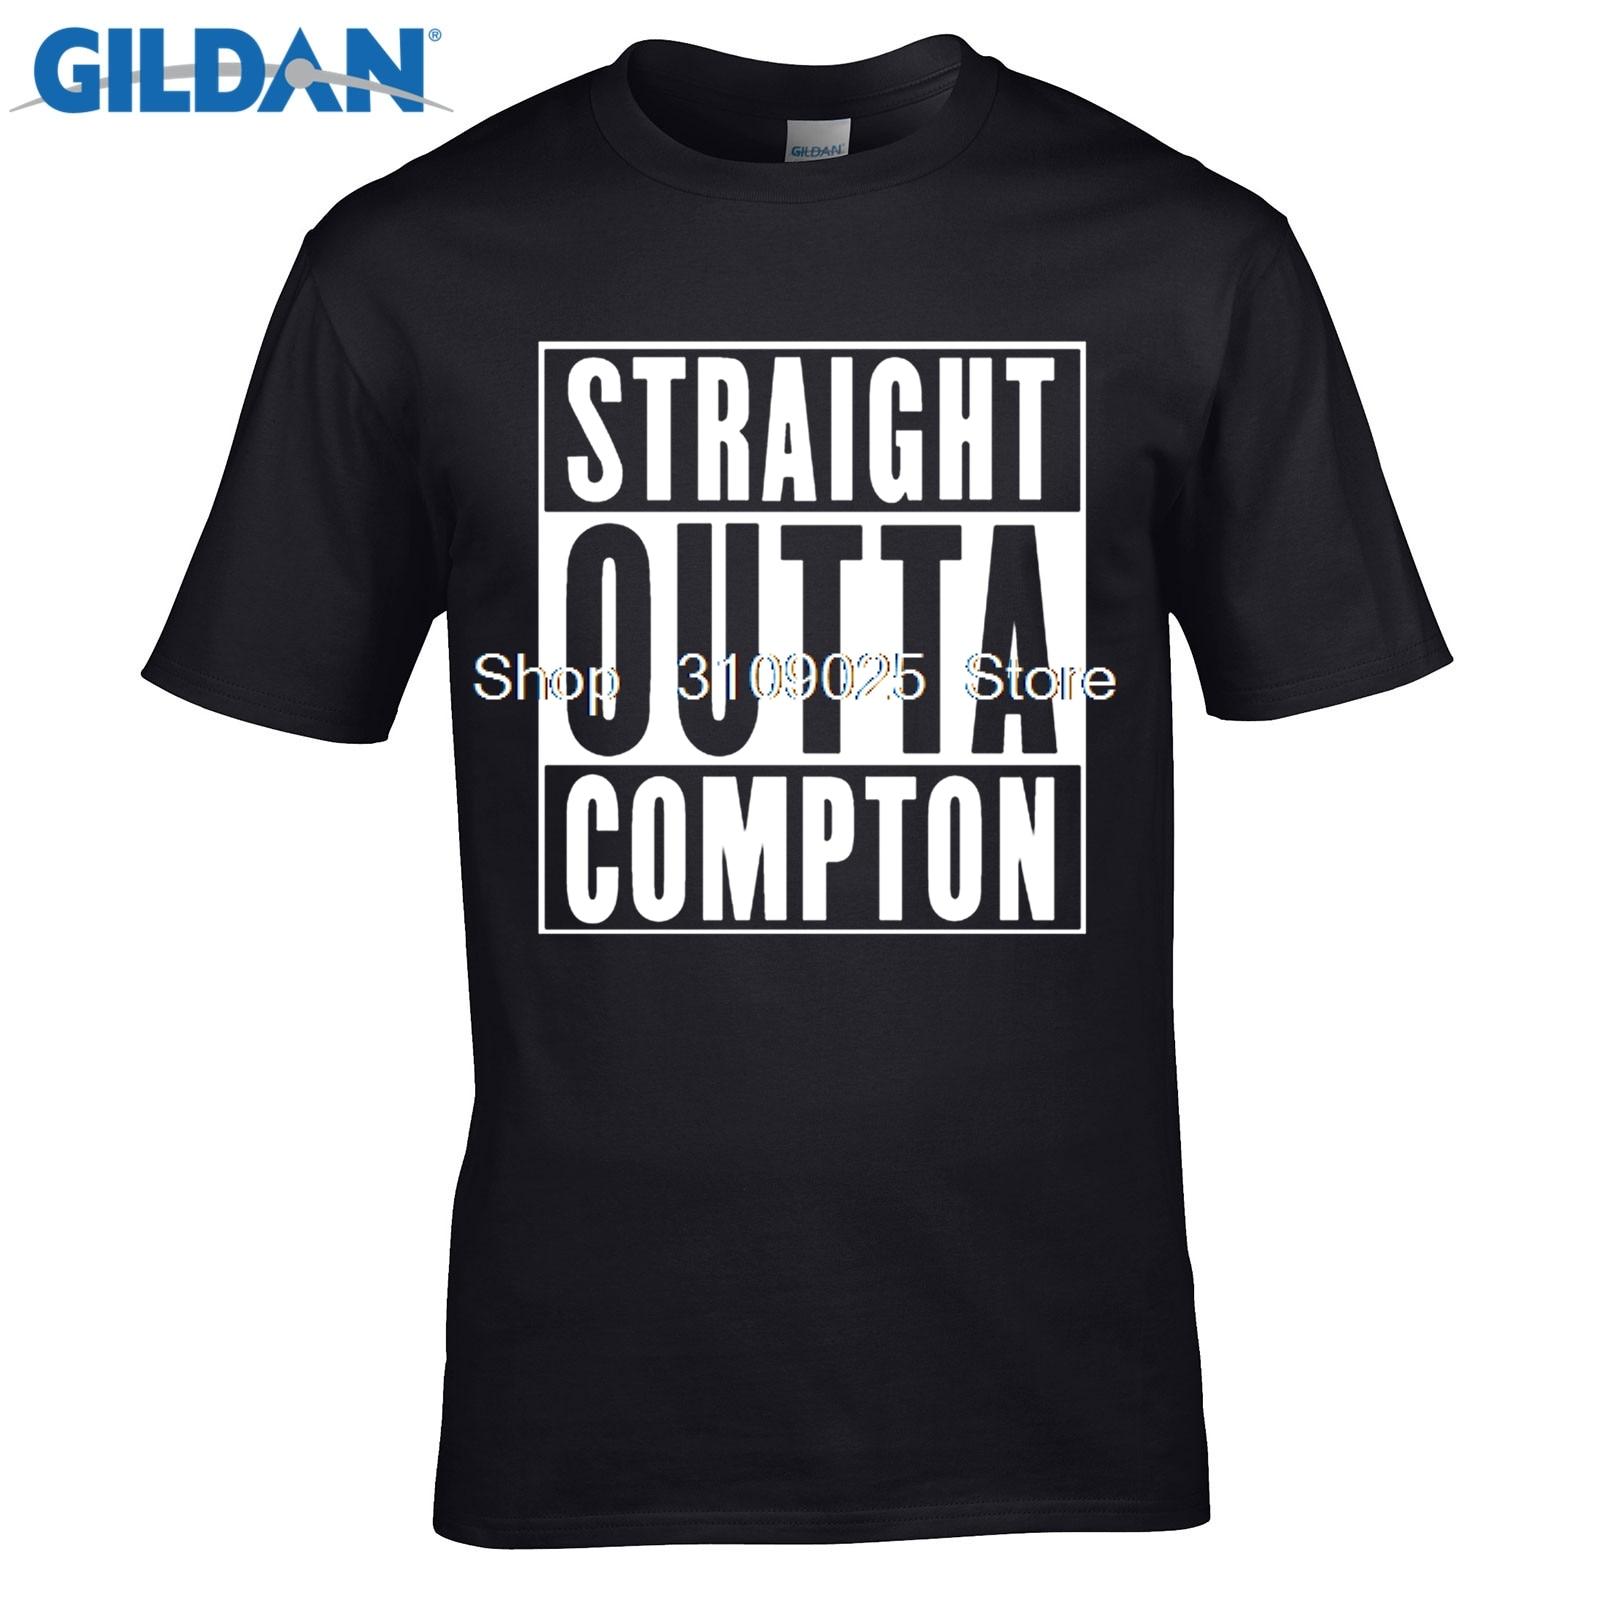 GILDAN funny men t shirt Compton Old English T-Shirt - Eazy E NWA Dr. Dre Easy Game - Al ...